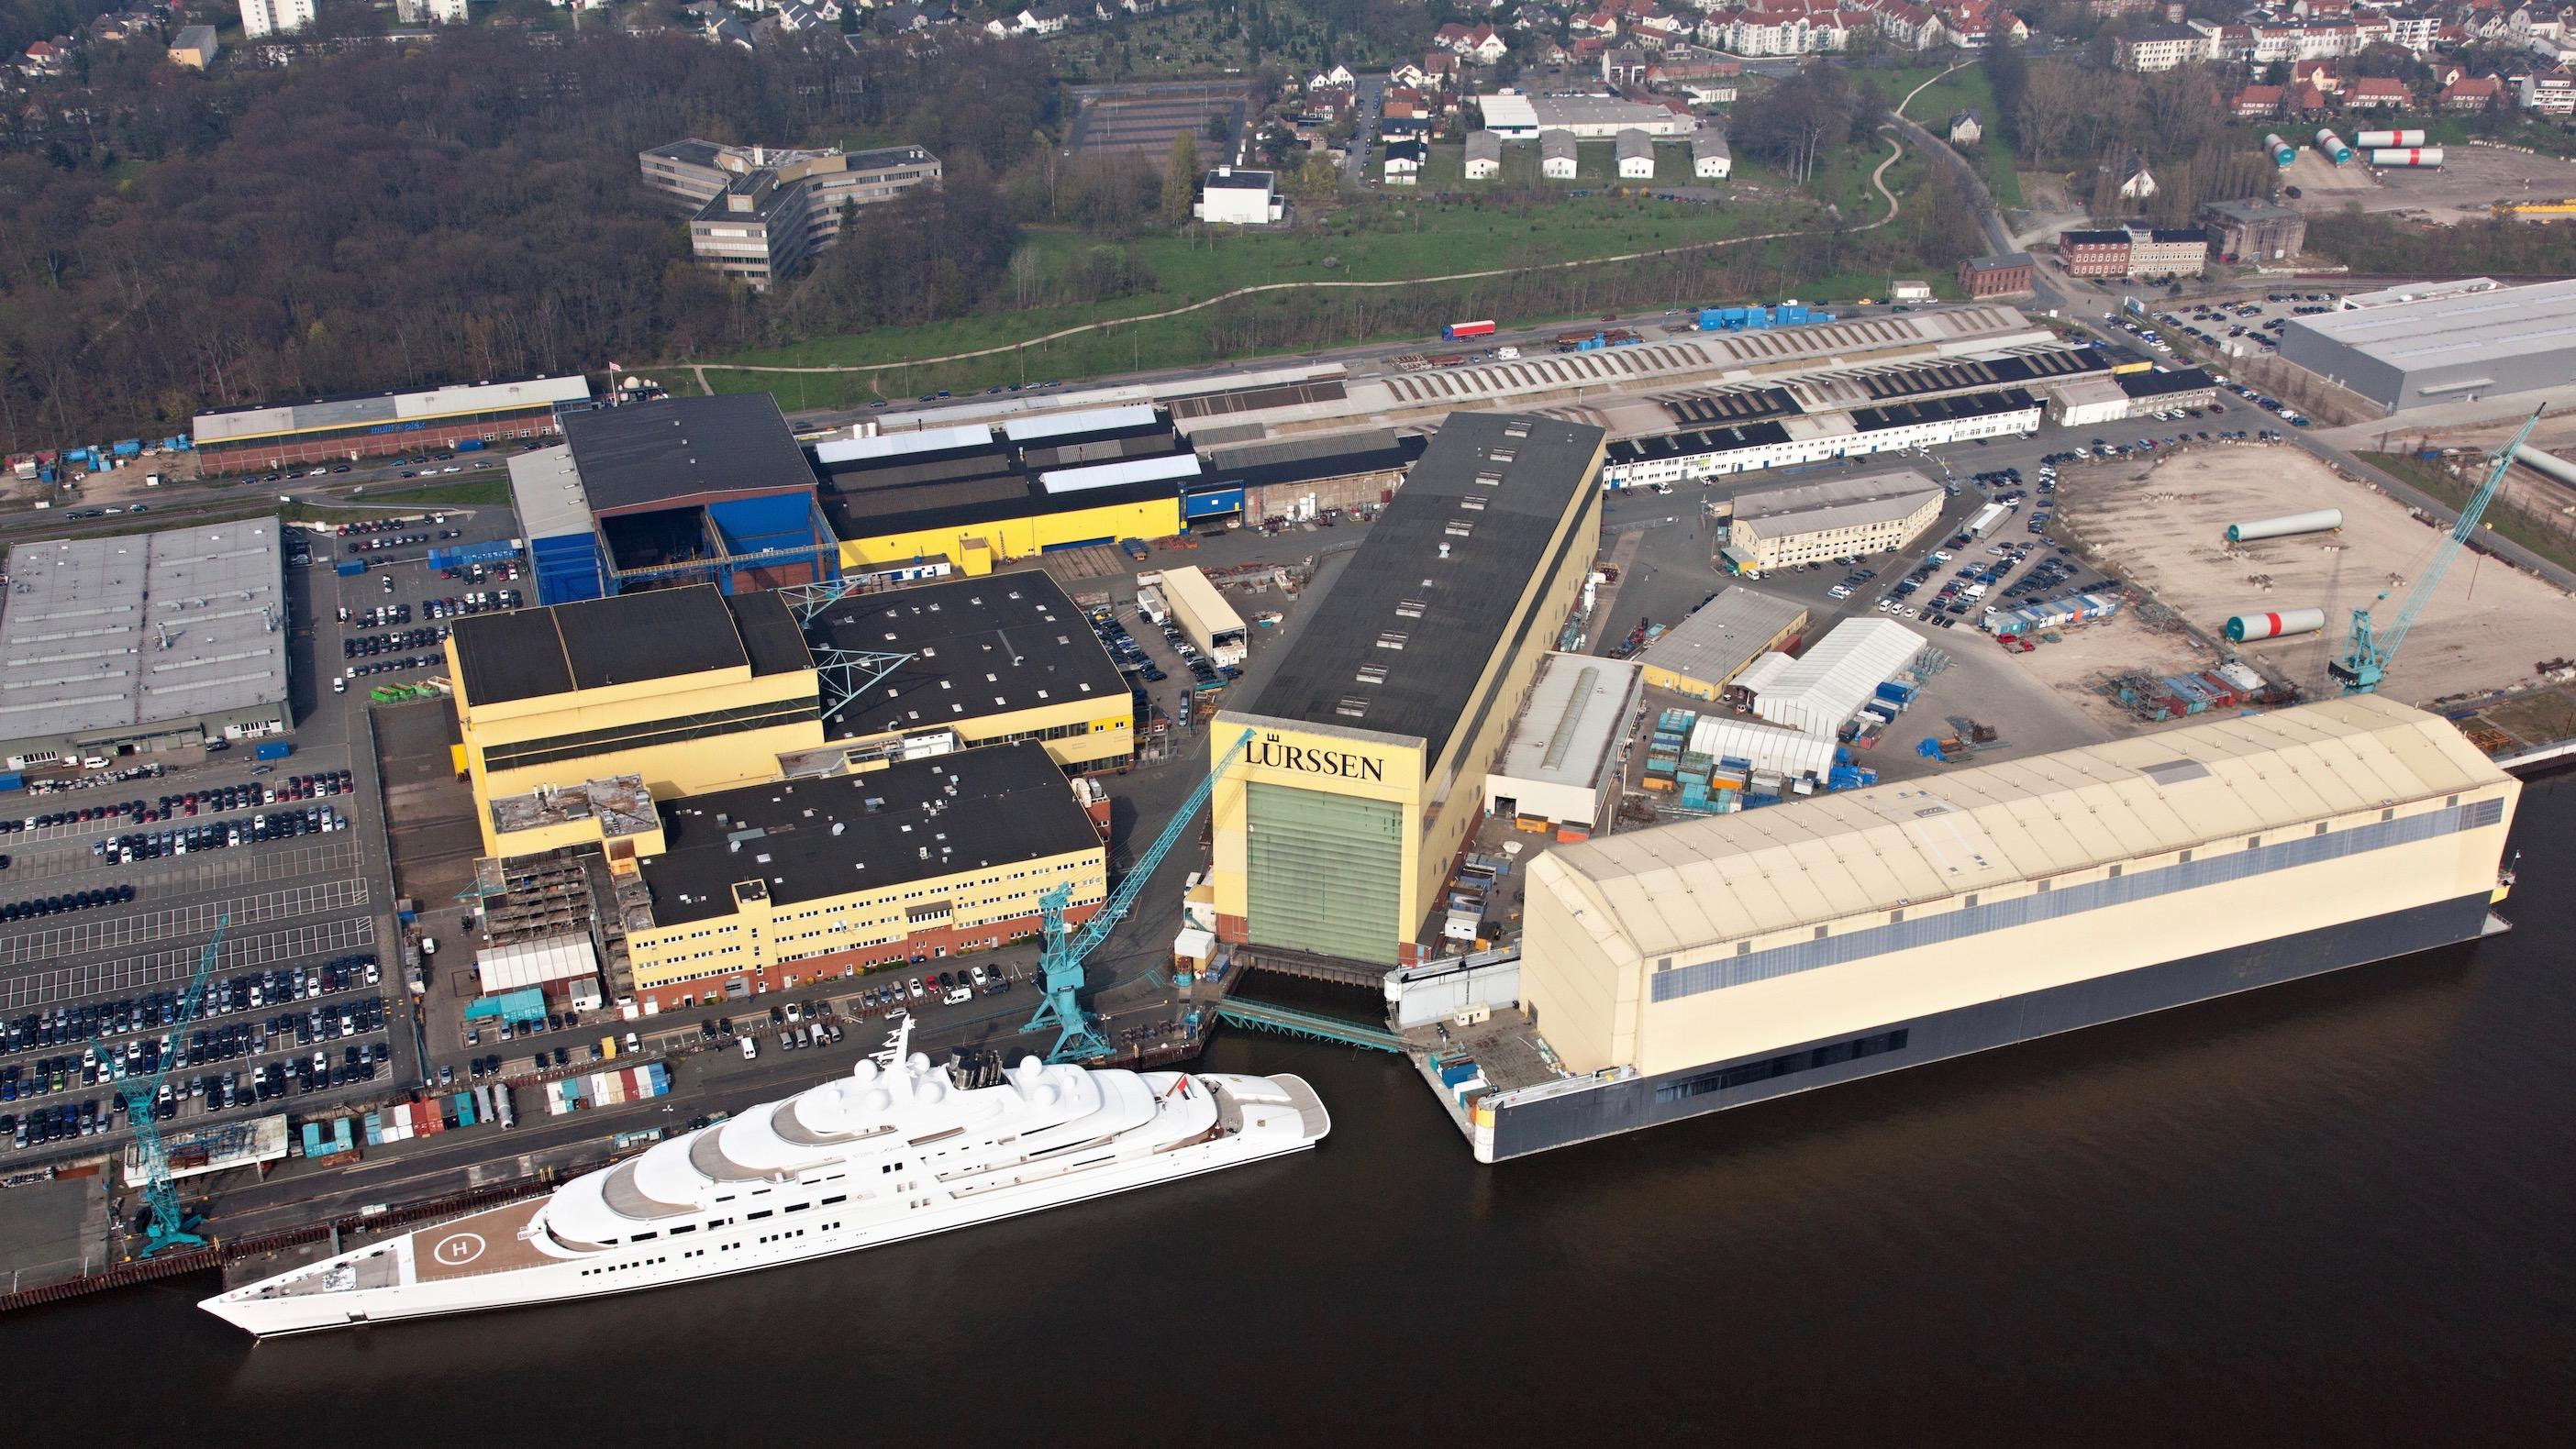 Lürssen Bremen Aumund Azzam Shipyard Germany